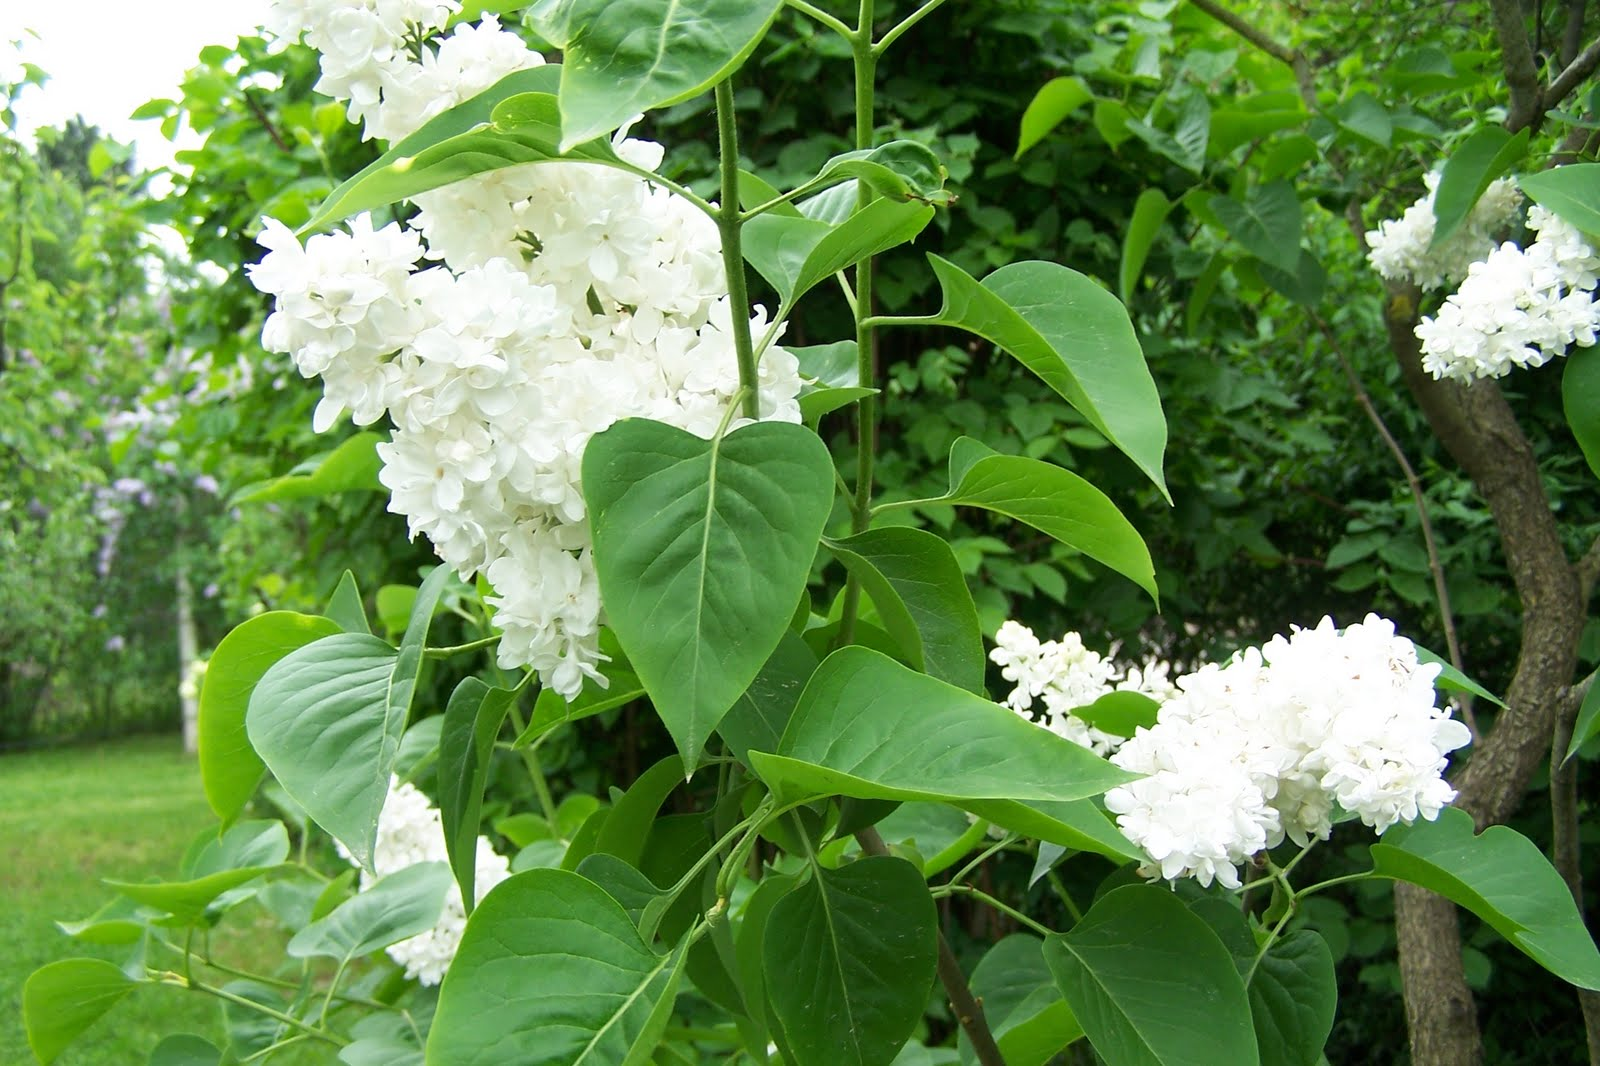 Eccomi fiori bianchi splendenti profumati e cavalli for Fiori bianchi profumati